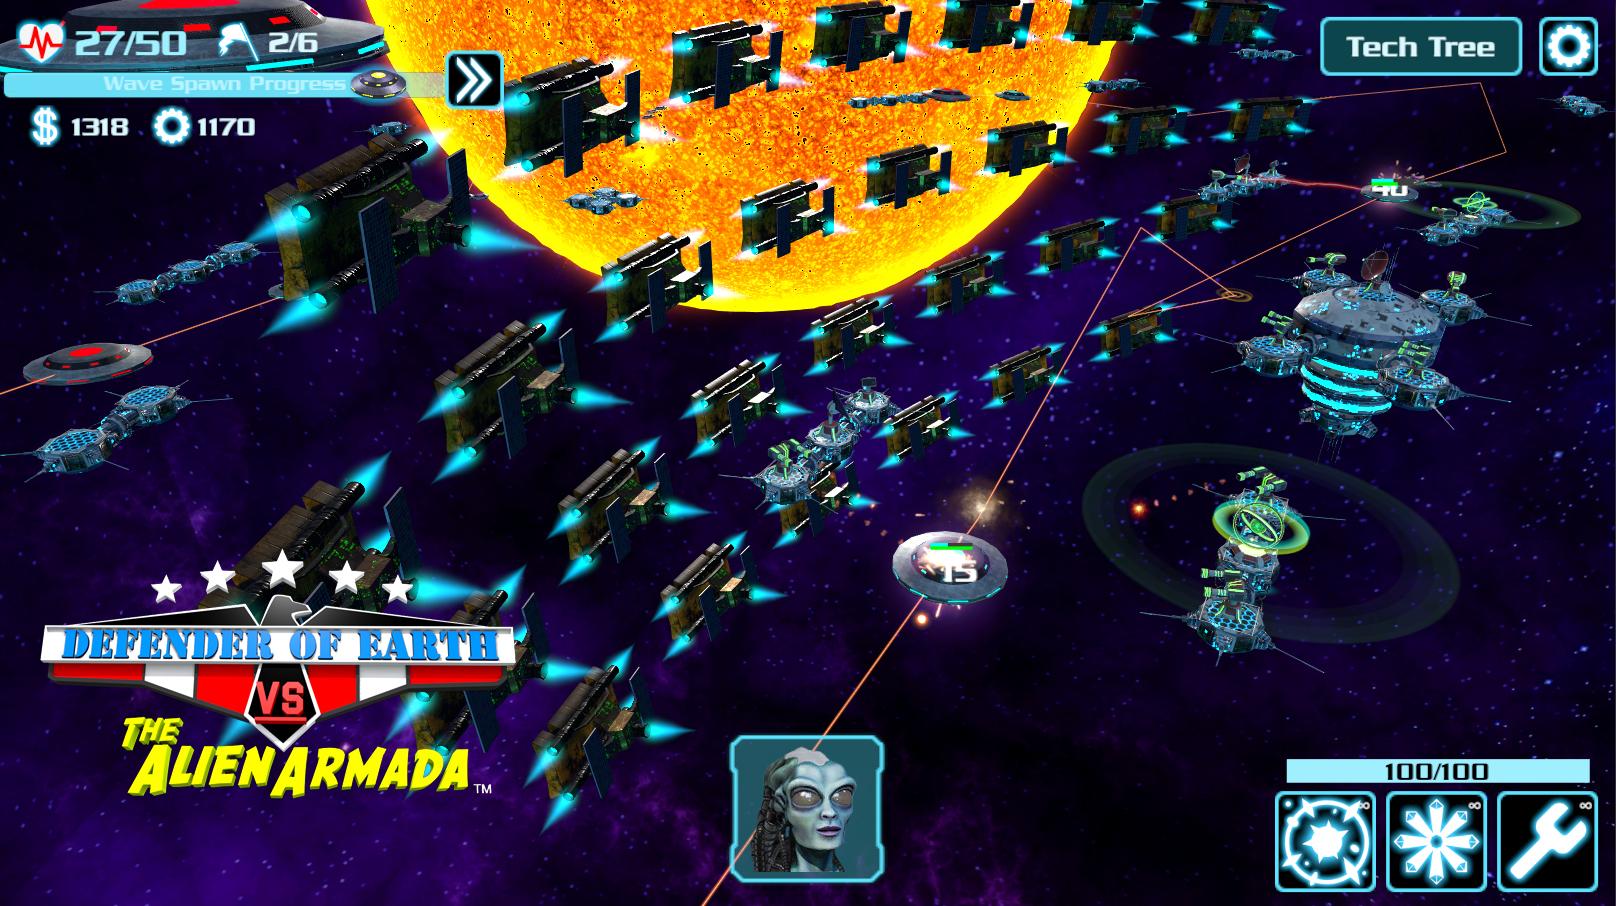 Defender of Earth vrs the Alien Armada